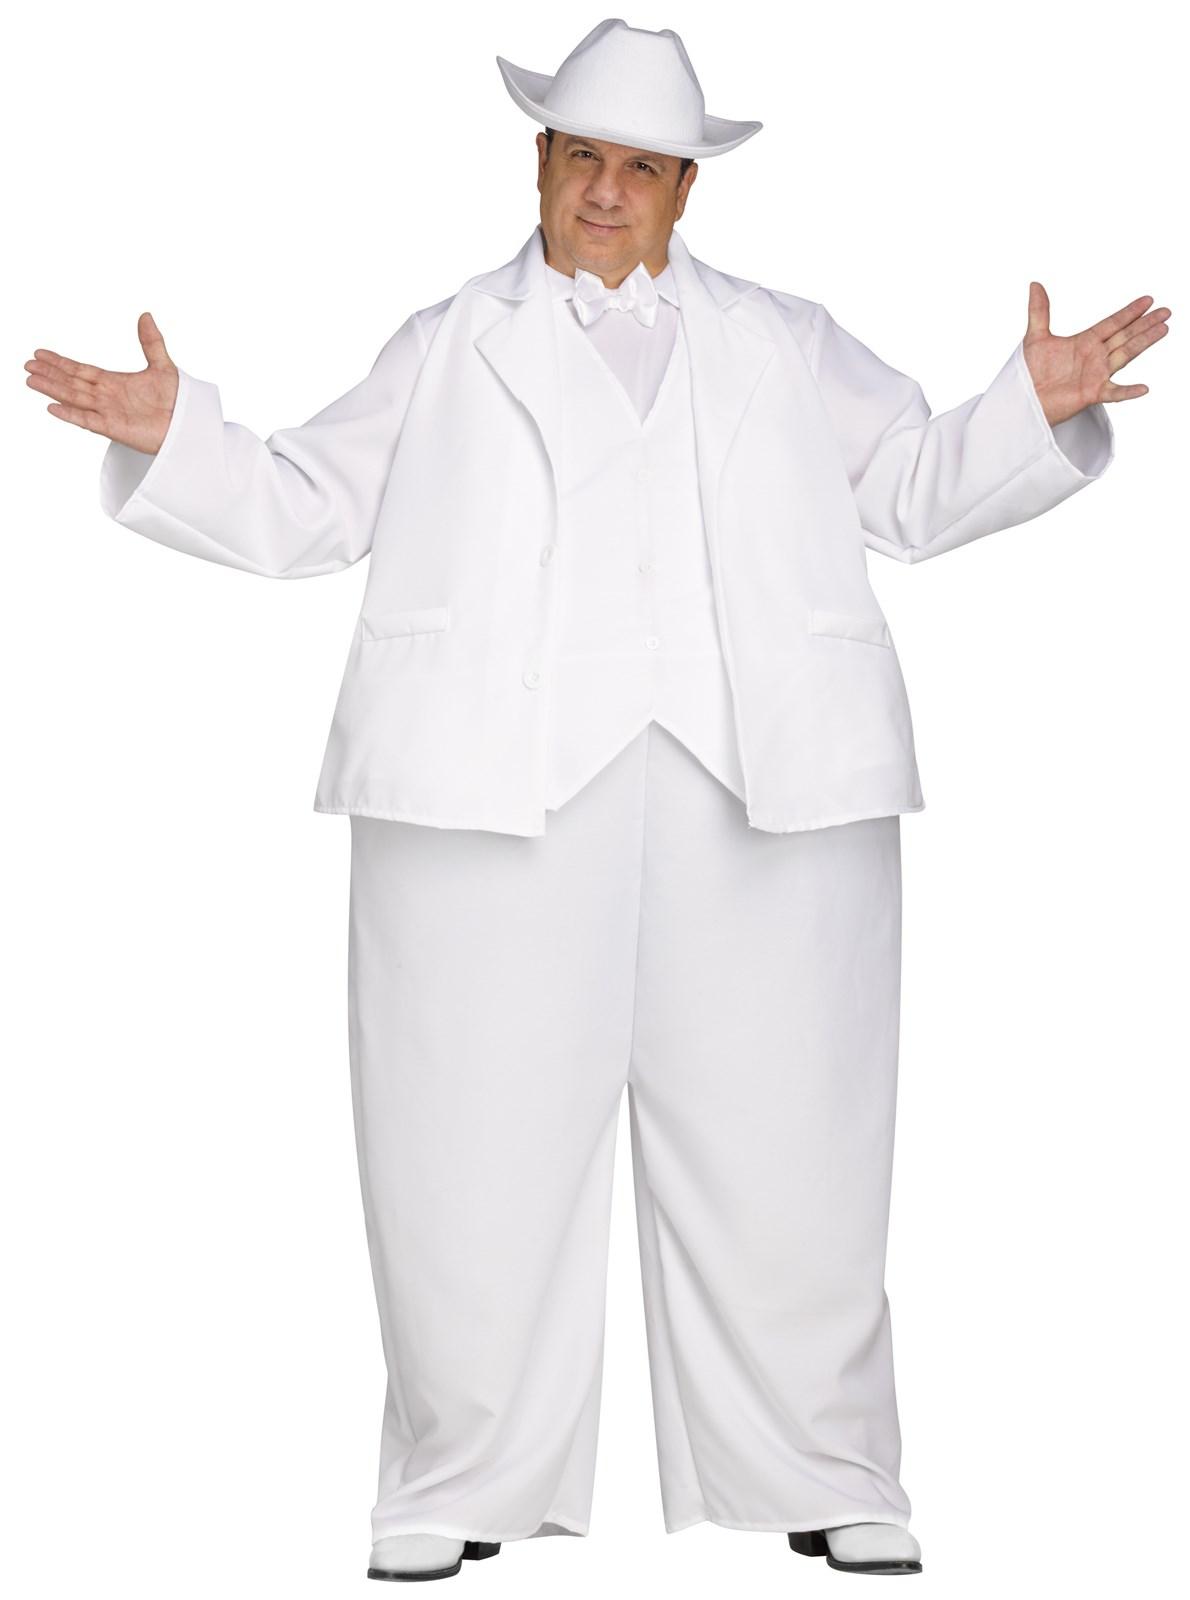 The Dukes of Hazzard Adult Boss Hogg Costume